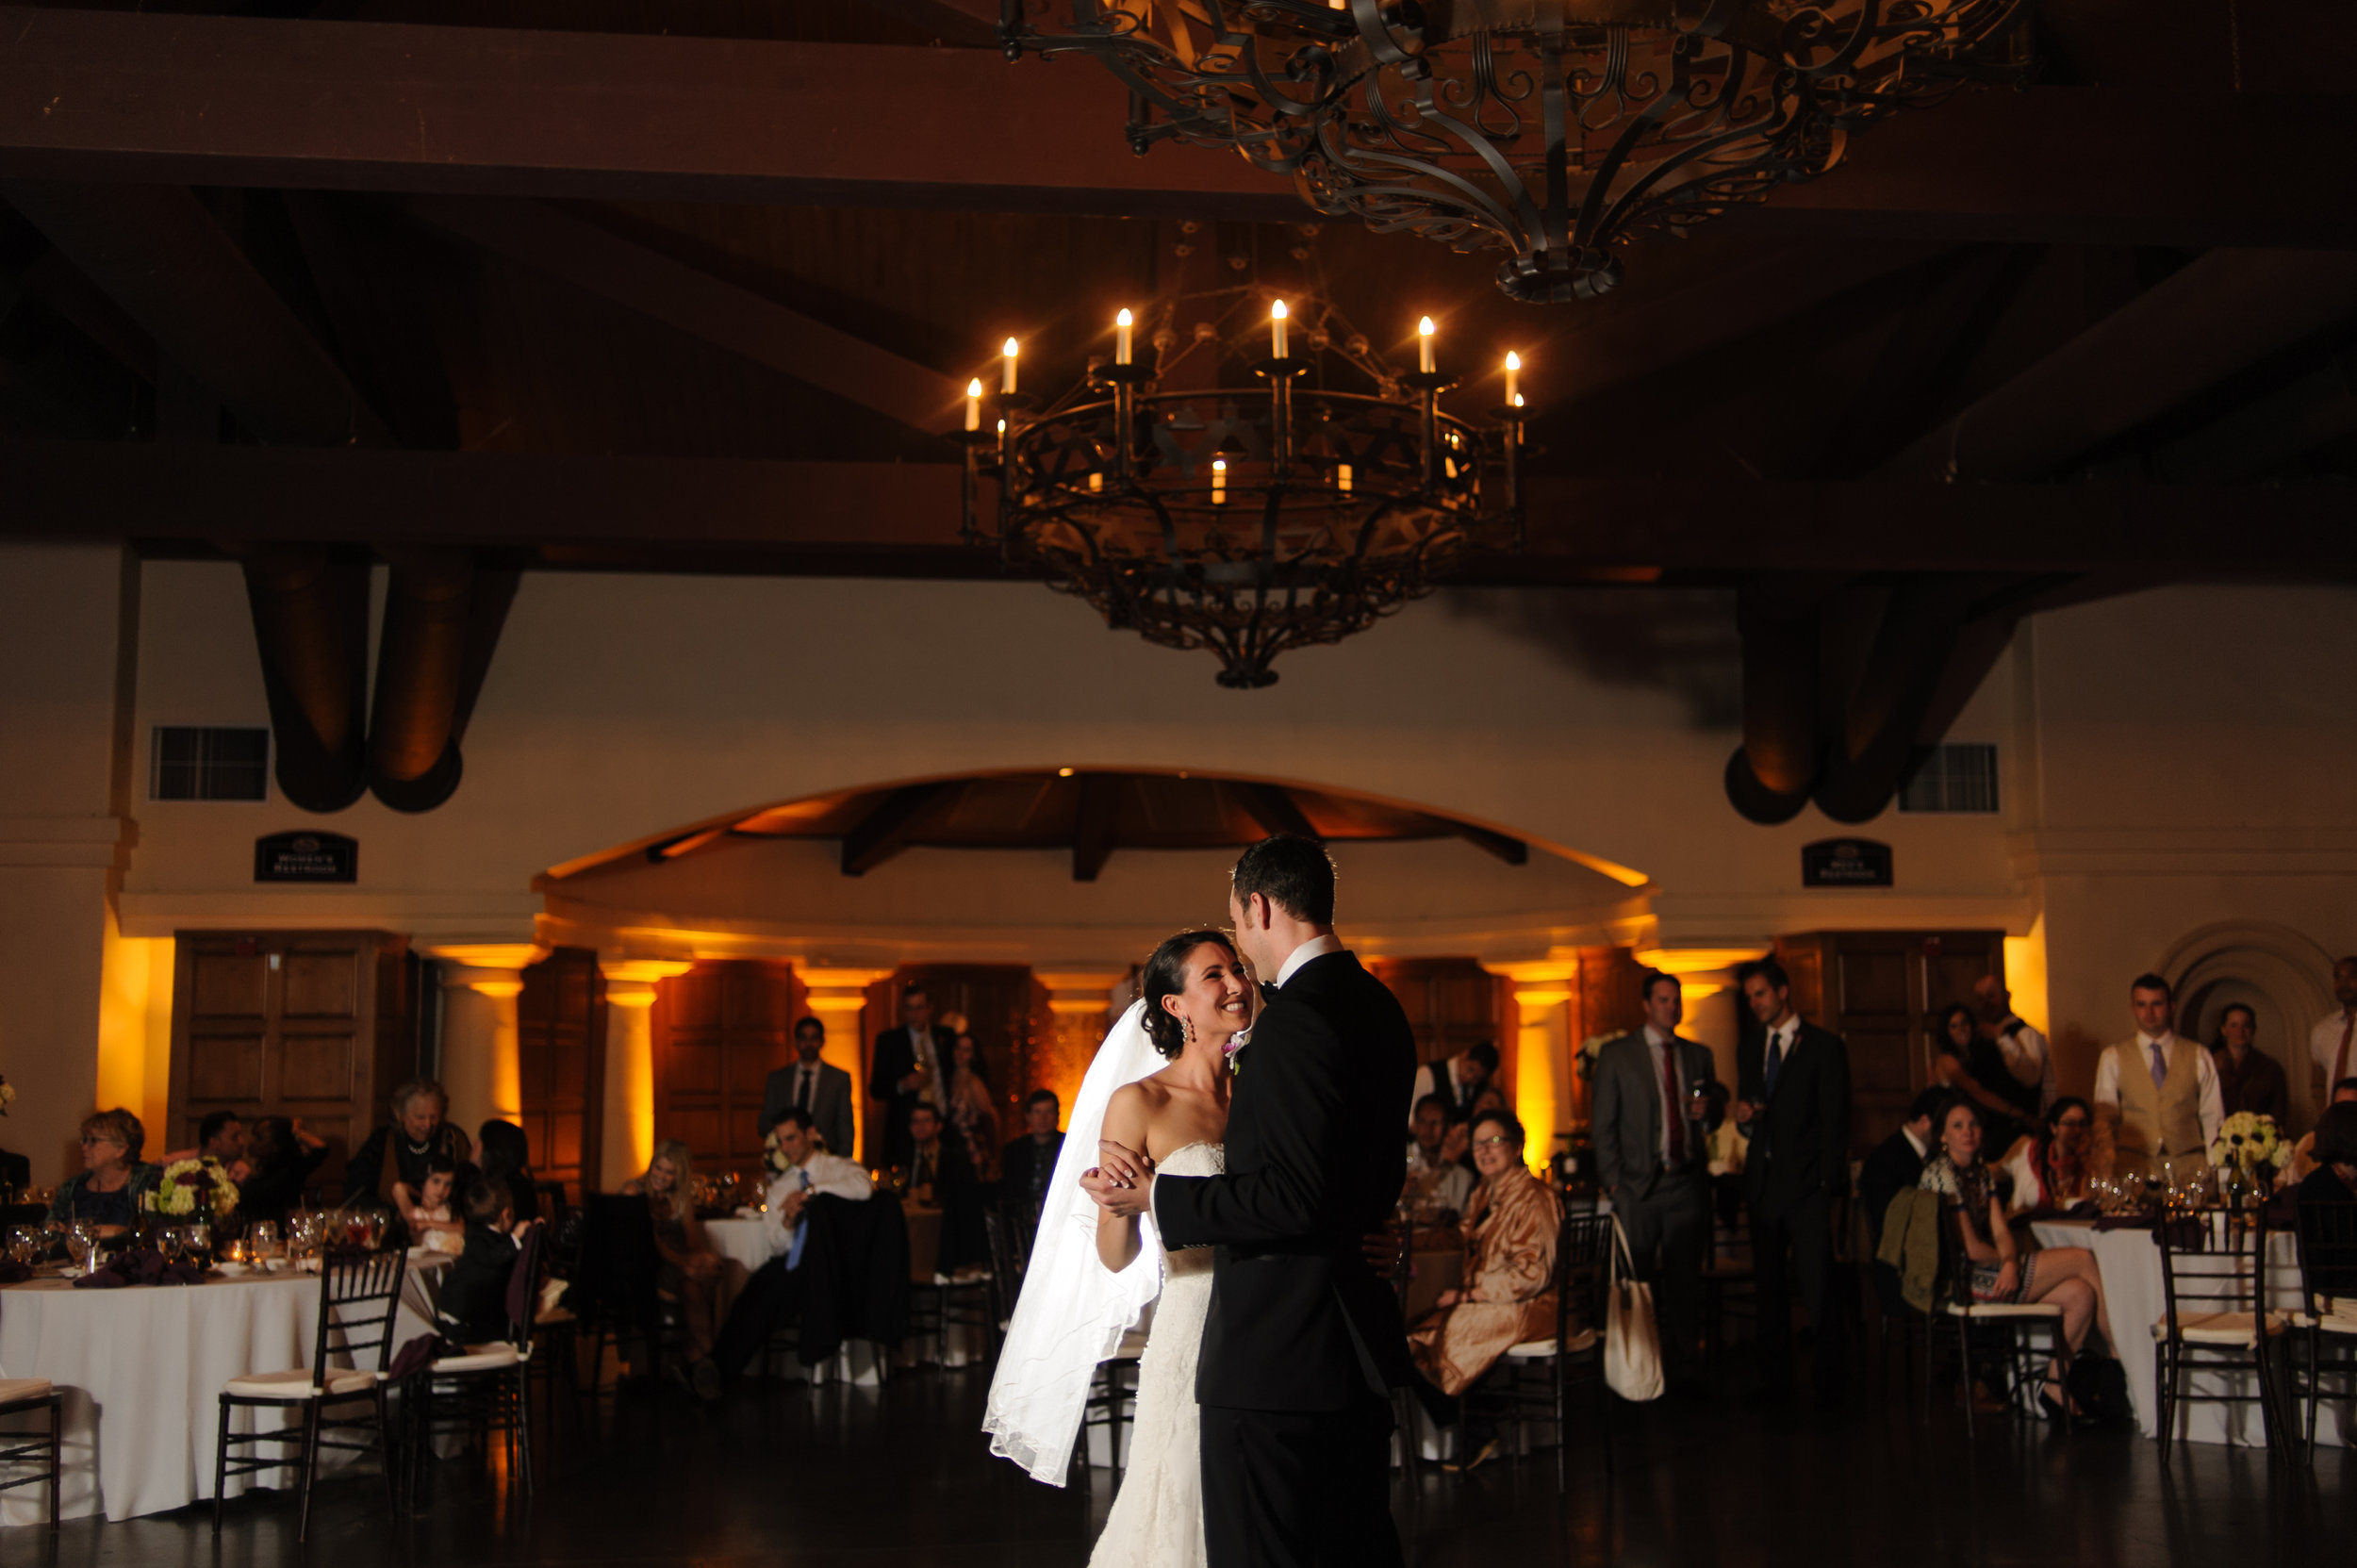 lindsey-jake-027-the-bridges-golf-course-san-ramon-wedding-photographer-katherine-nicole-photography.JPG